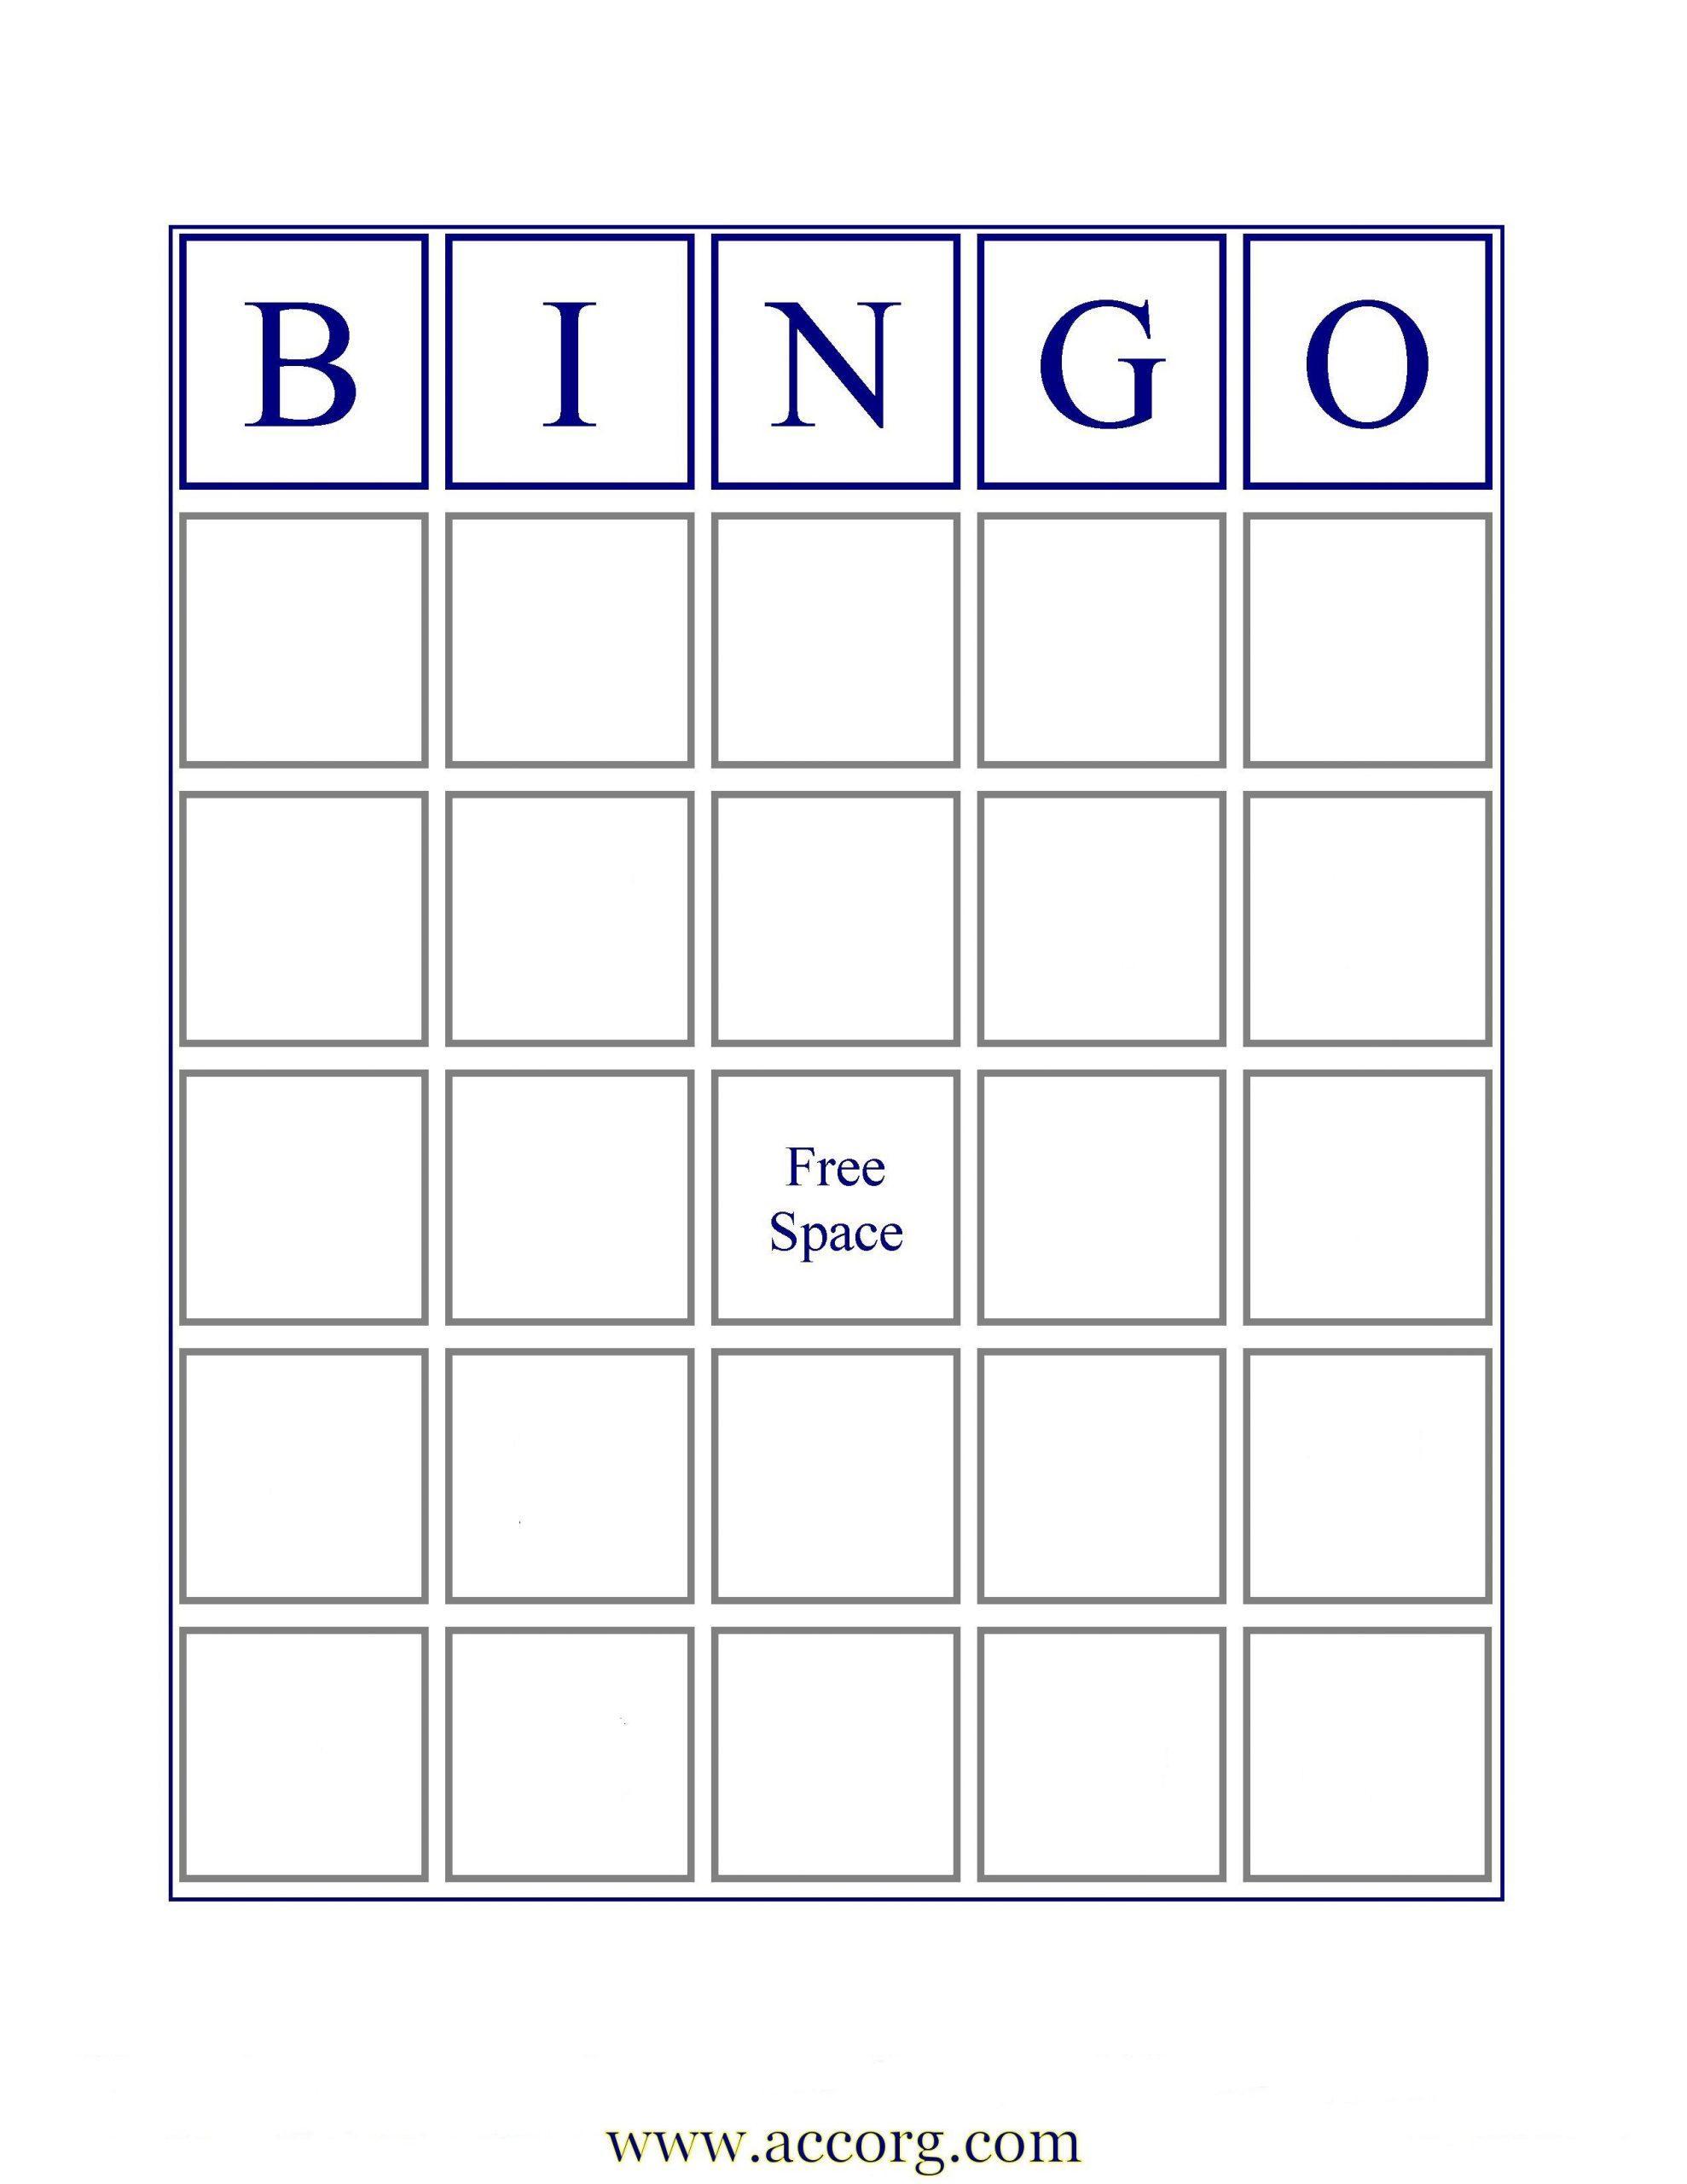 Free+Blank+Bingo+Cards